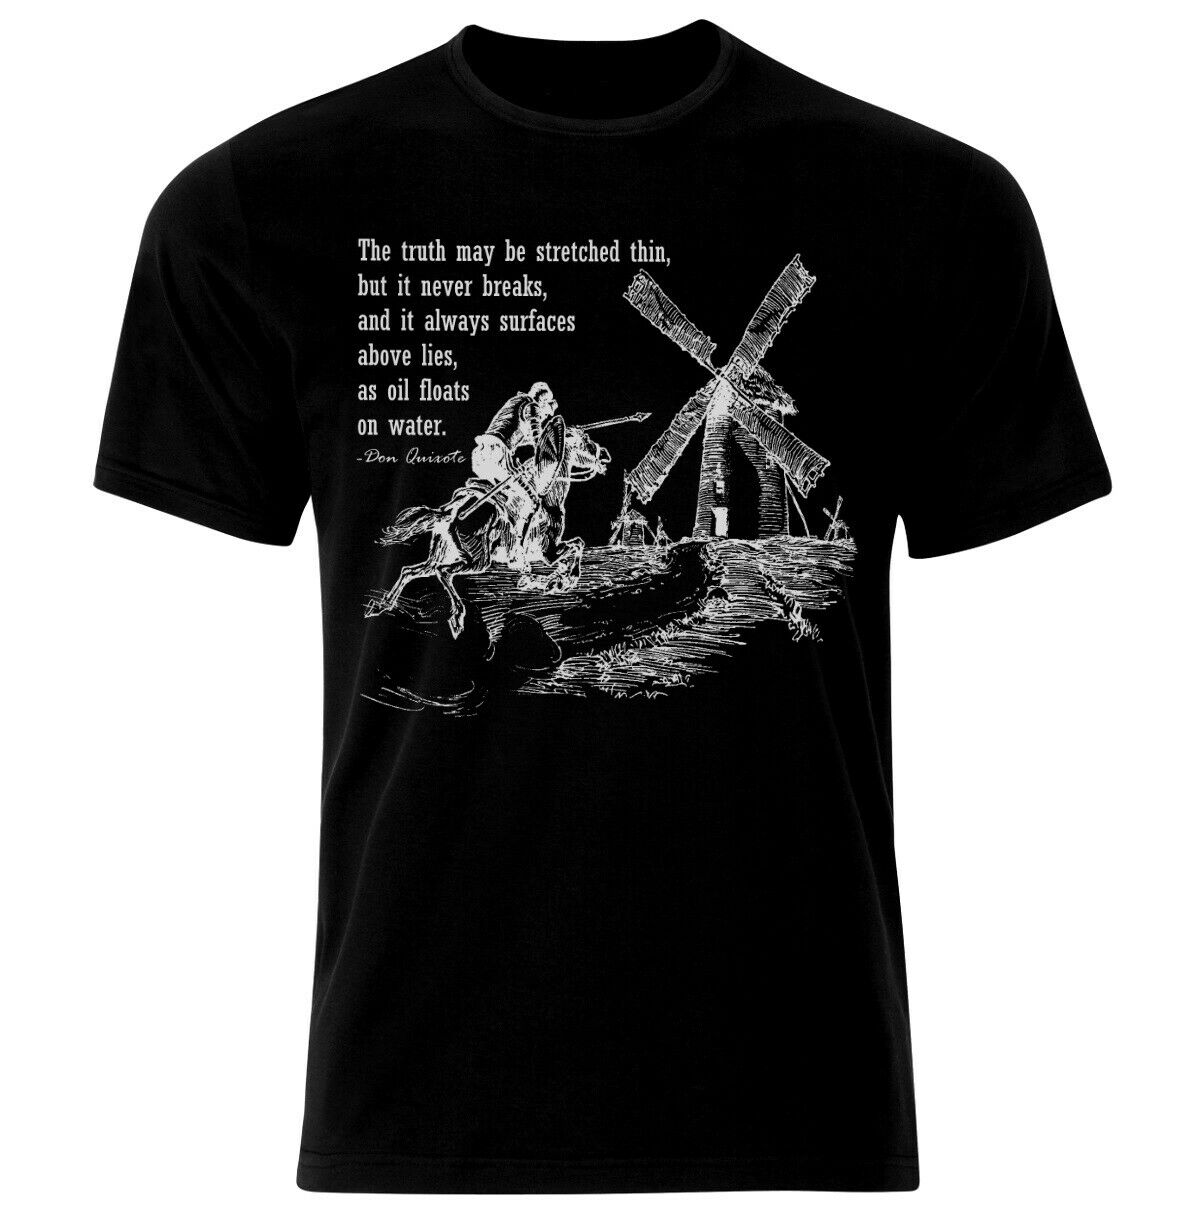 Don Quijote Sancho Panza citas Picasso de Miguel de Cervantes camiseta Camiseta...